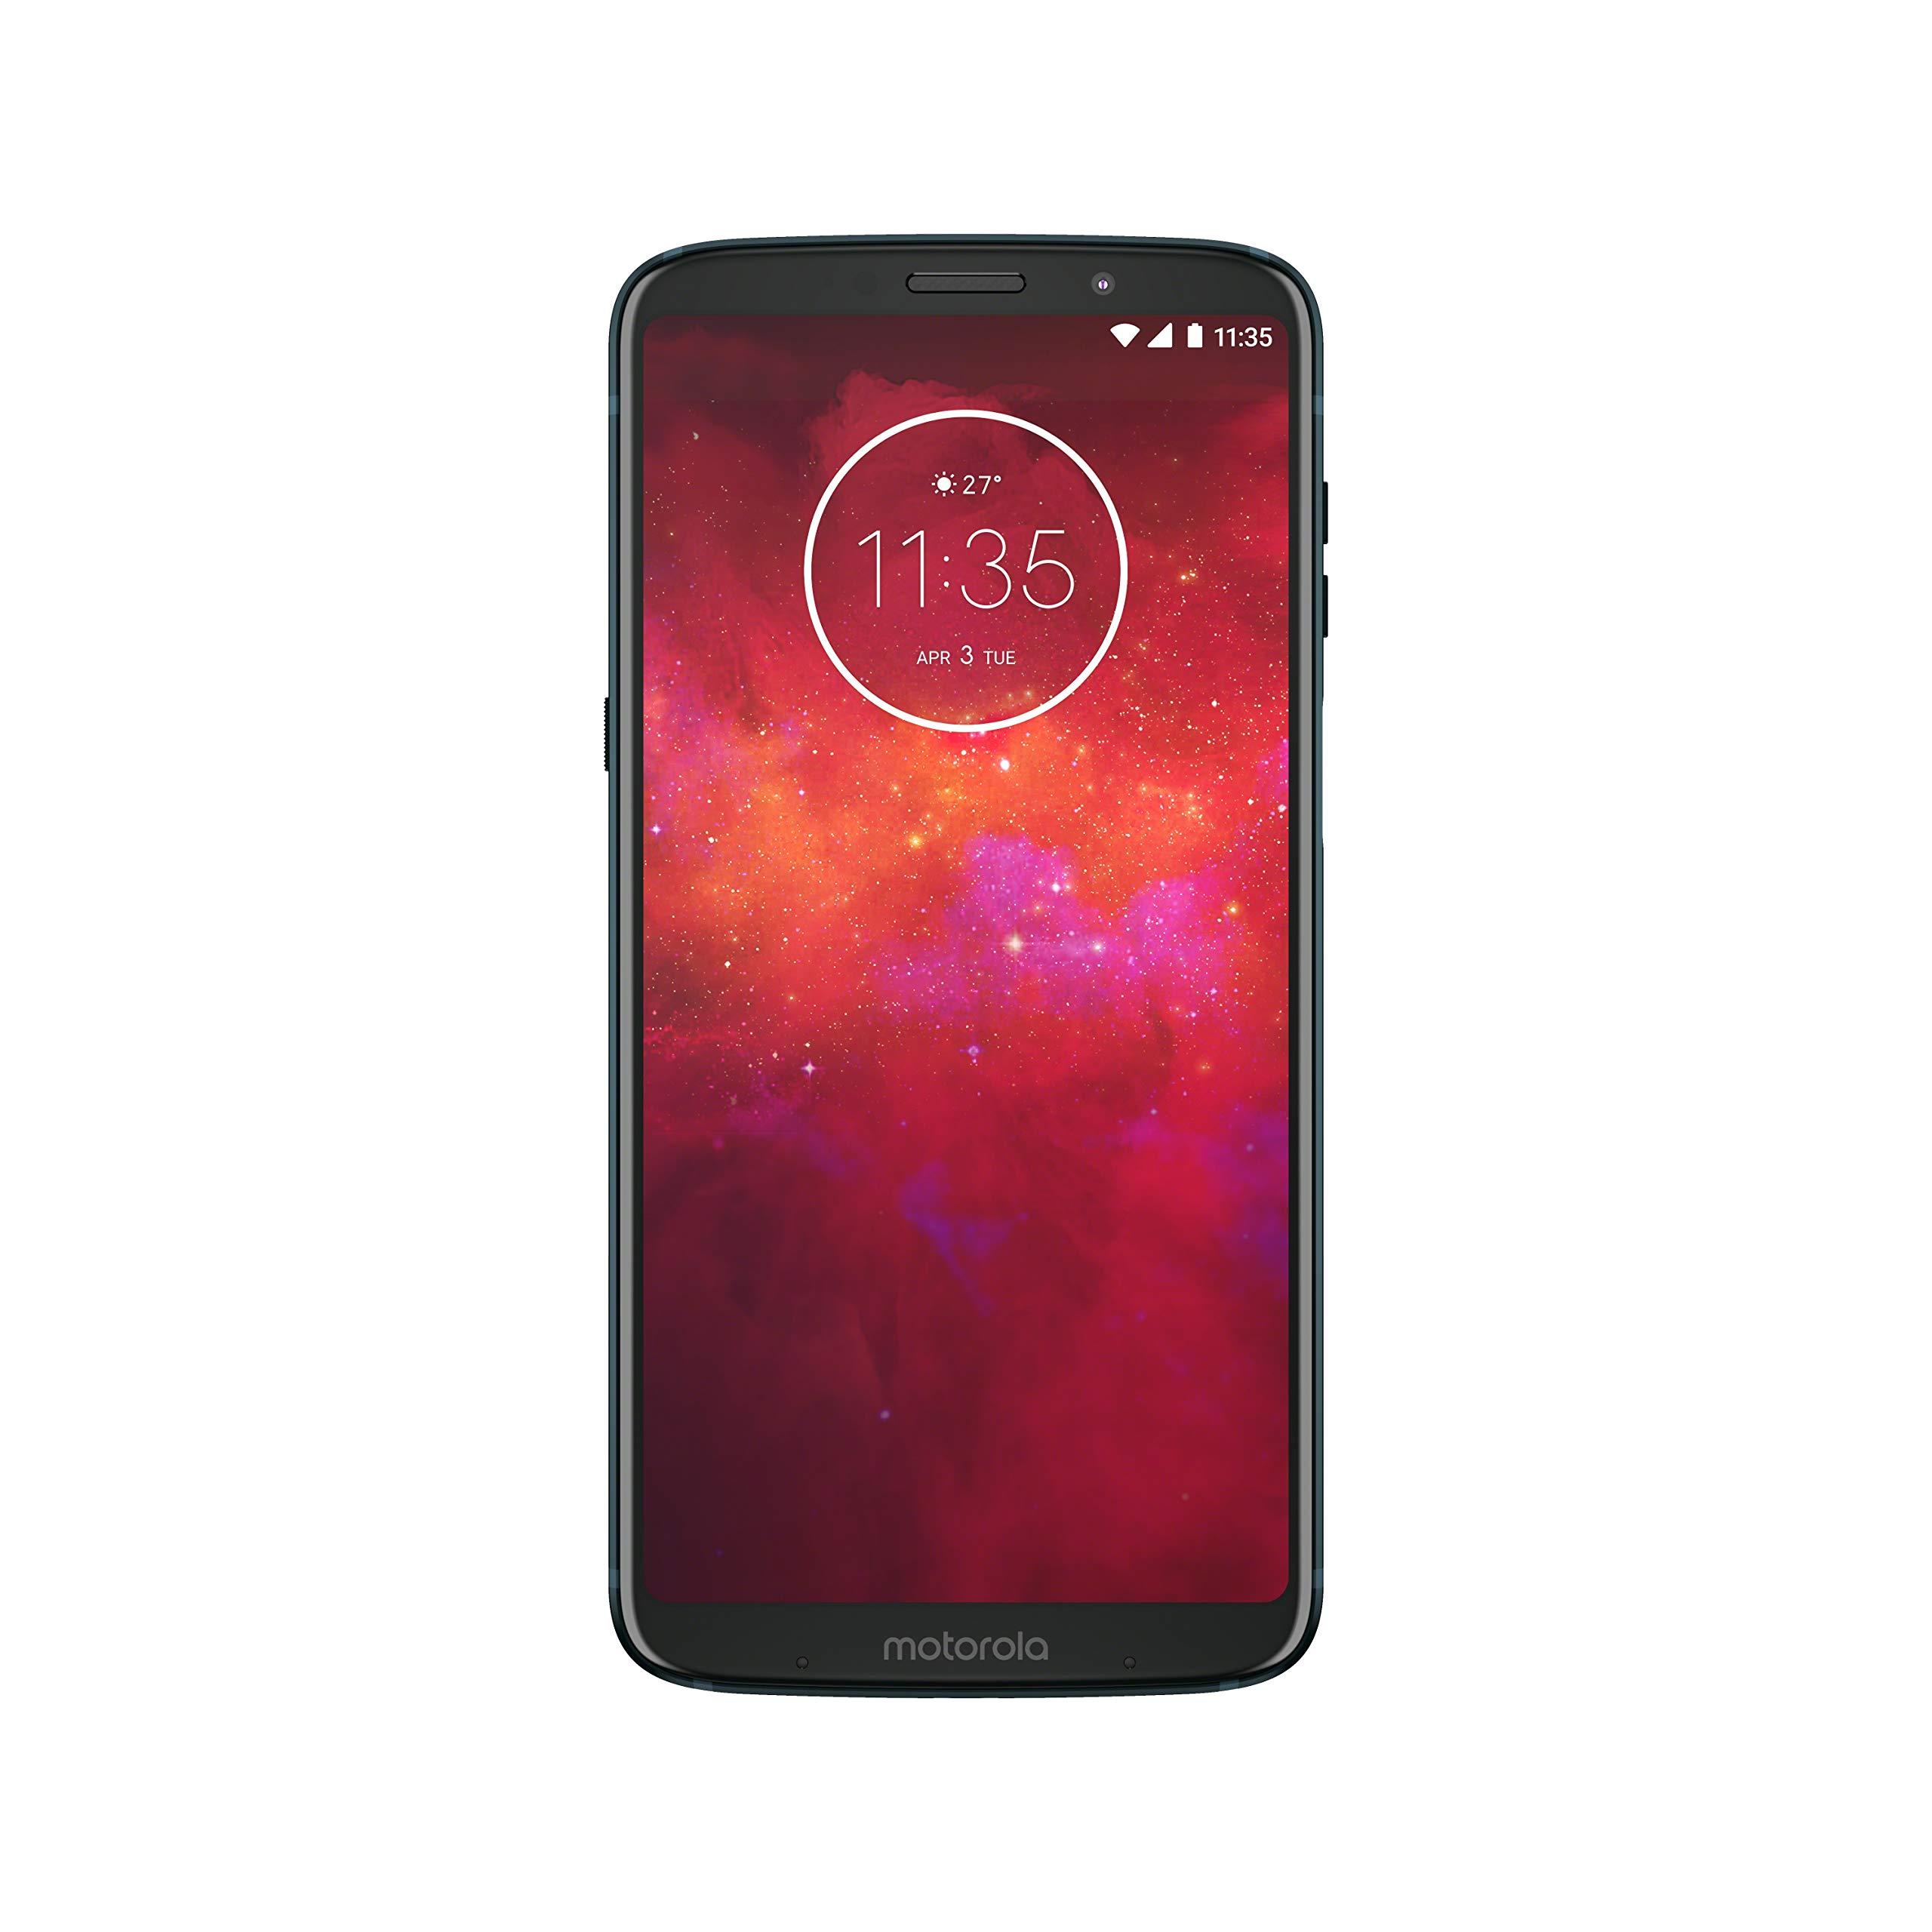 Moto Z3 Play – Unlocked – 32 GB – Deep Indigo (US Warranty) – Verizon, AT&T, T-Mobile, Sprint